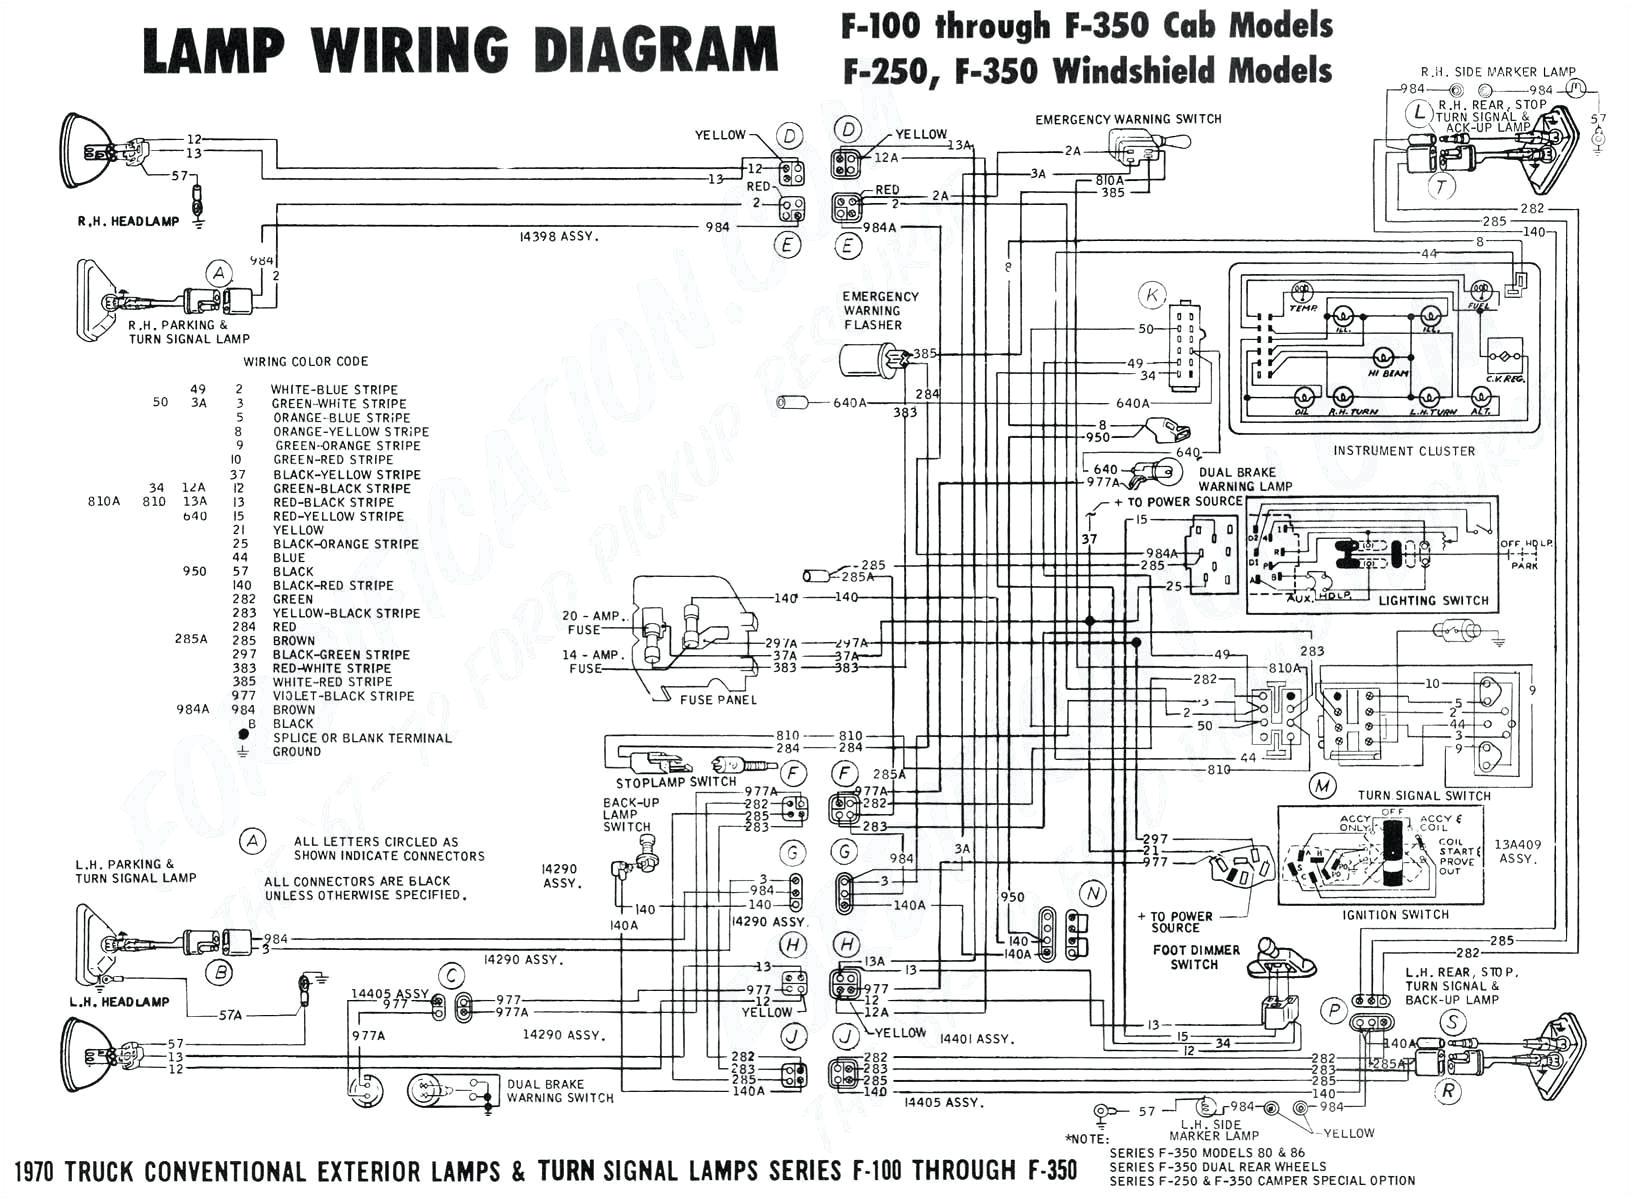 Wesbar Trailer Light Wiring Diagram. Off-road Light Wiring ... on